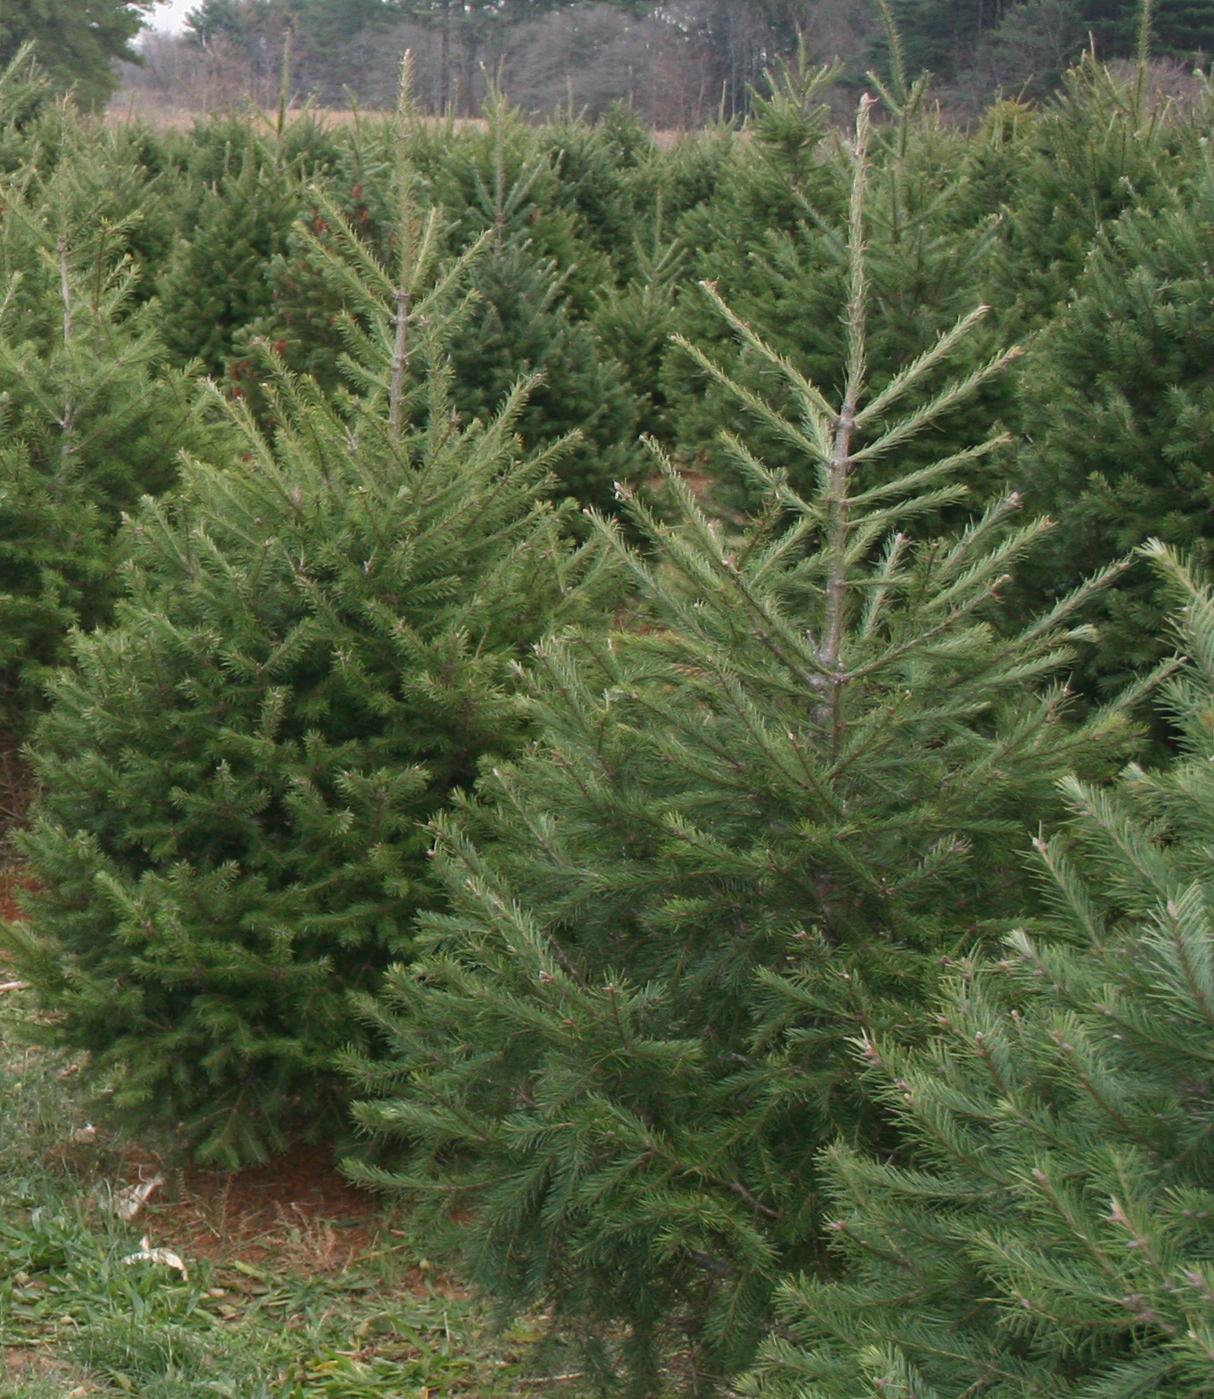 Delaware-grown Christmas trees